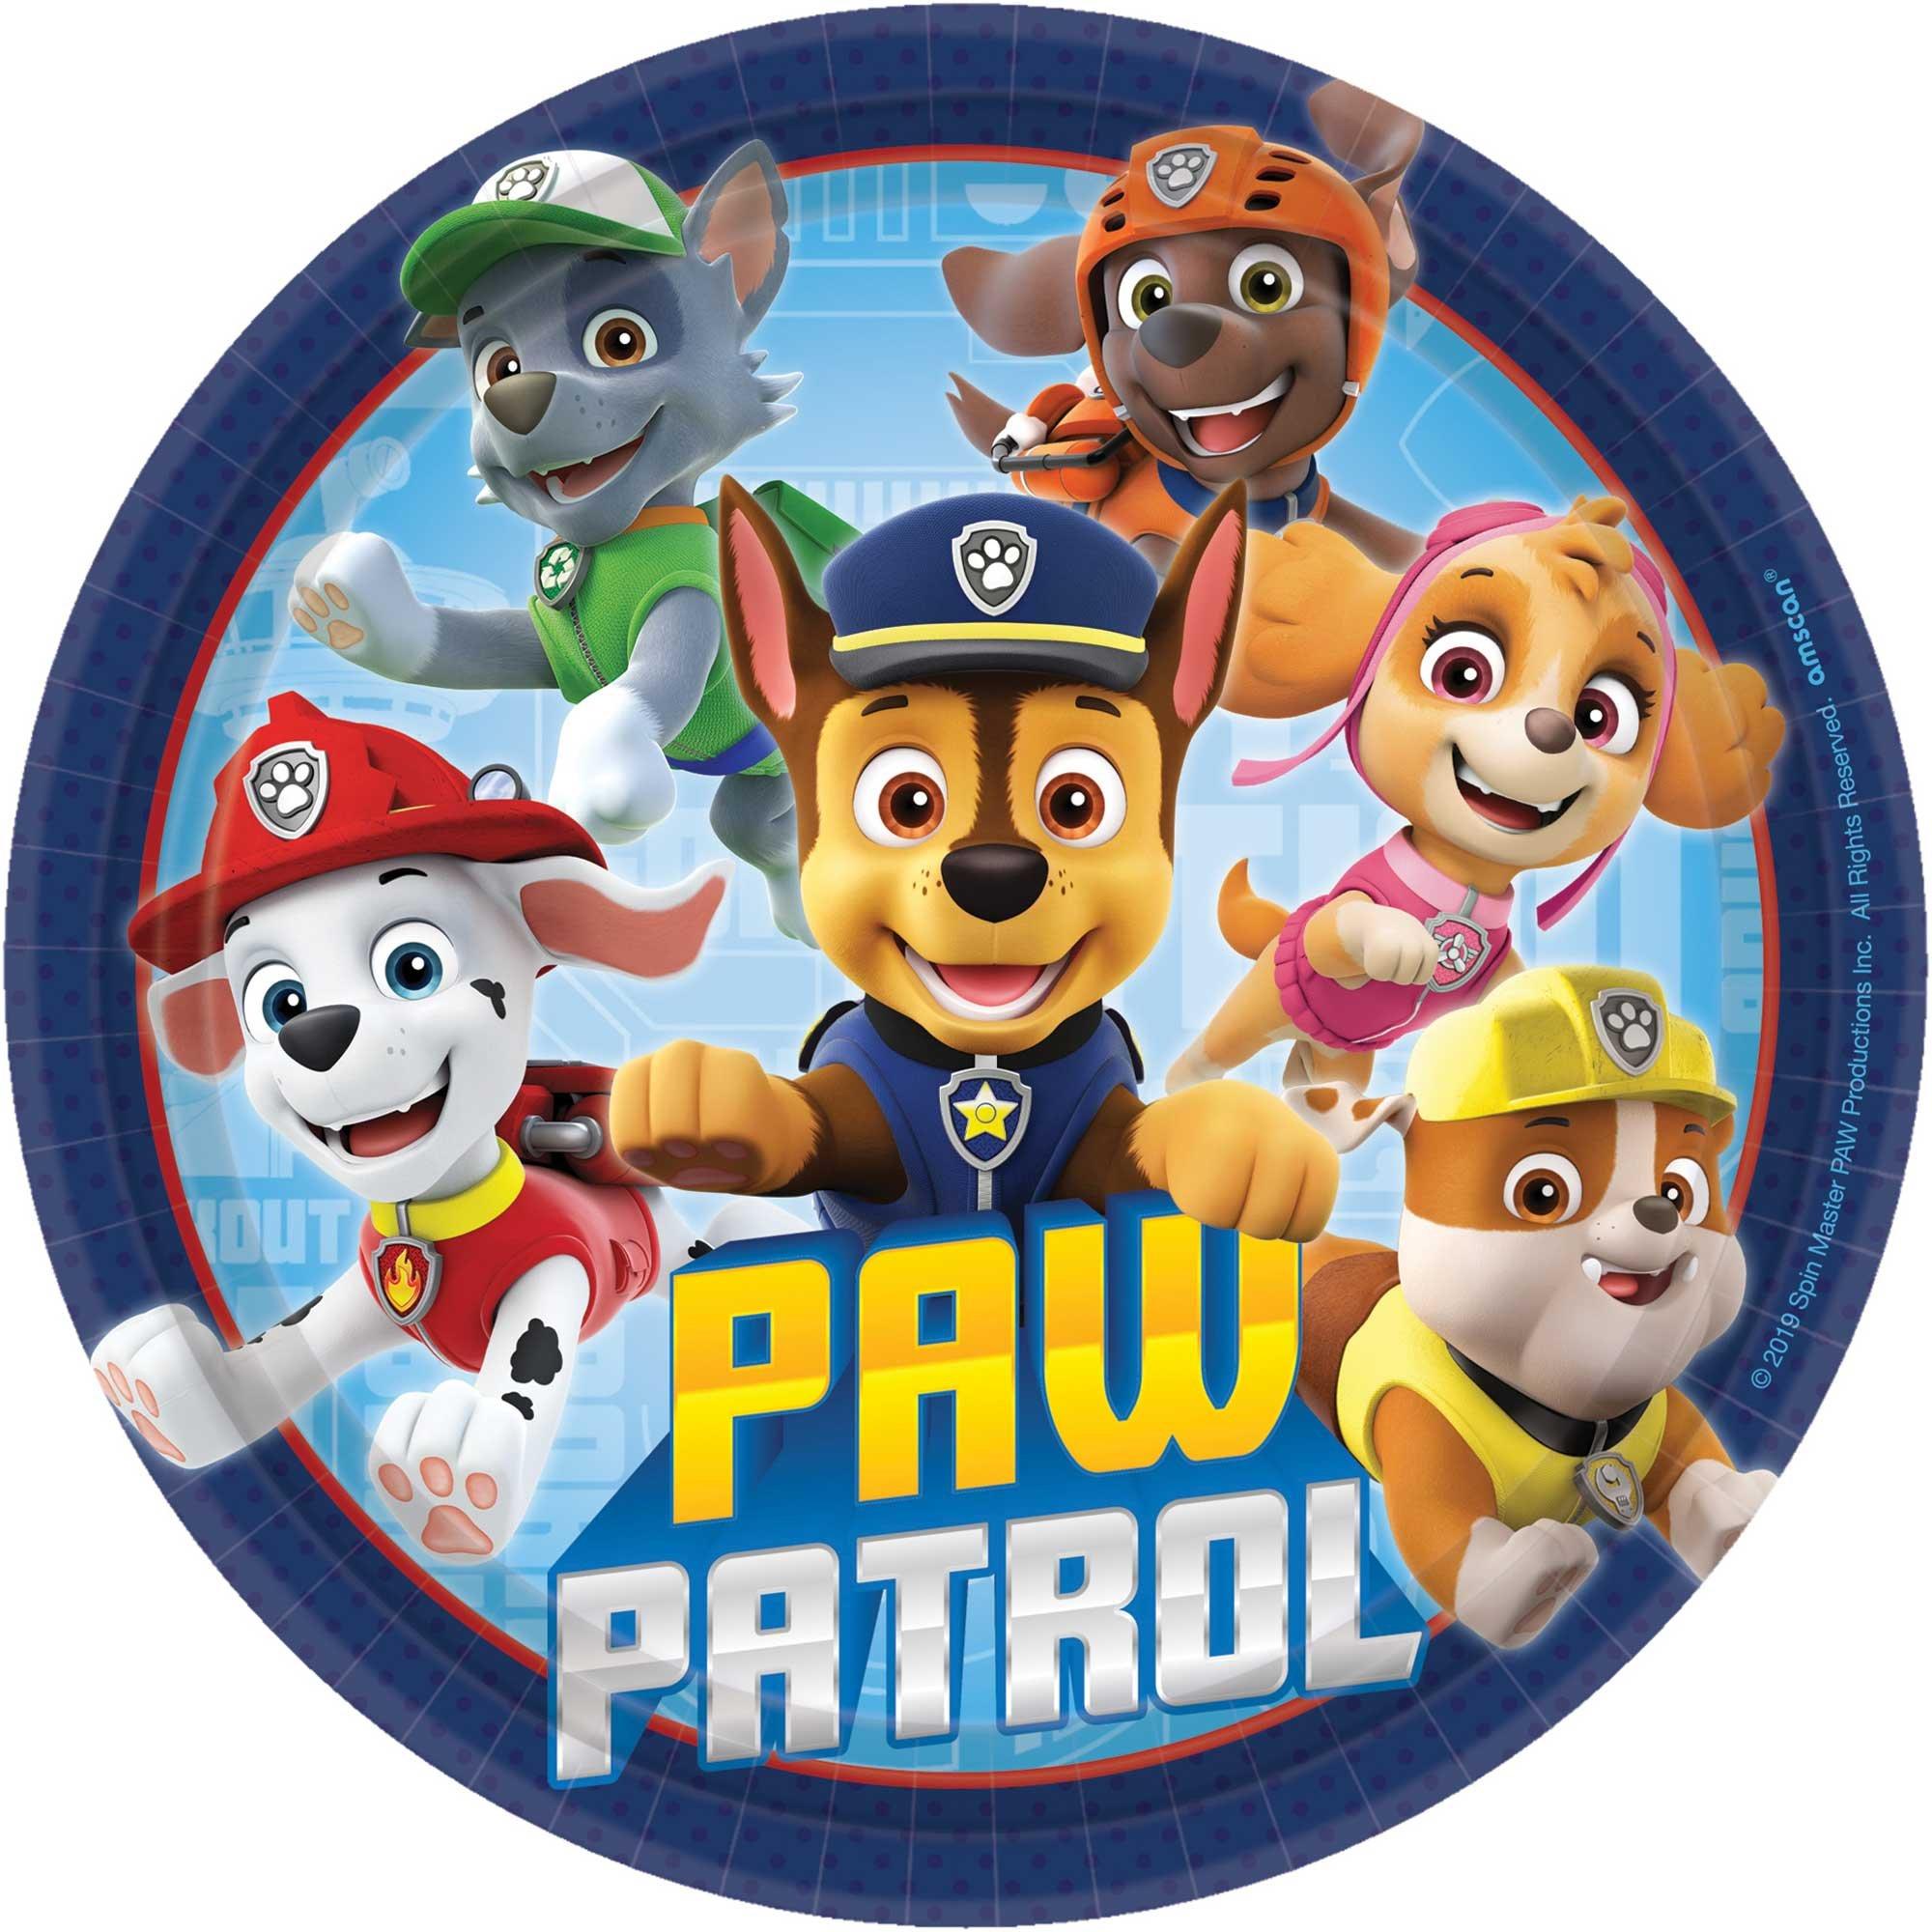 """Paw Patrol Adventures 7""""/ 17cm Round Plates"